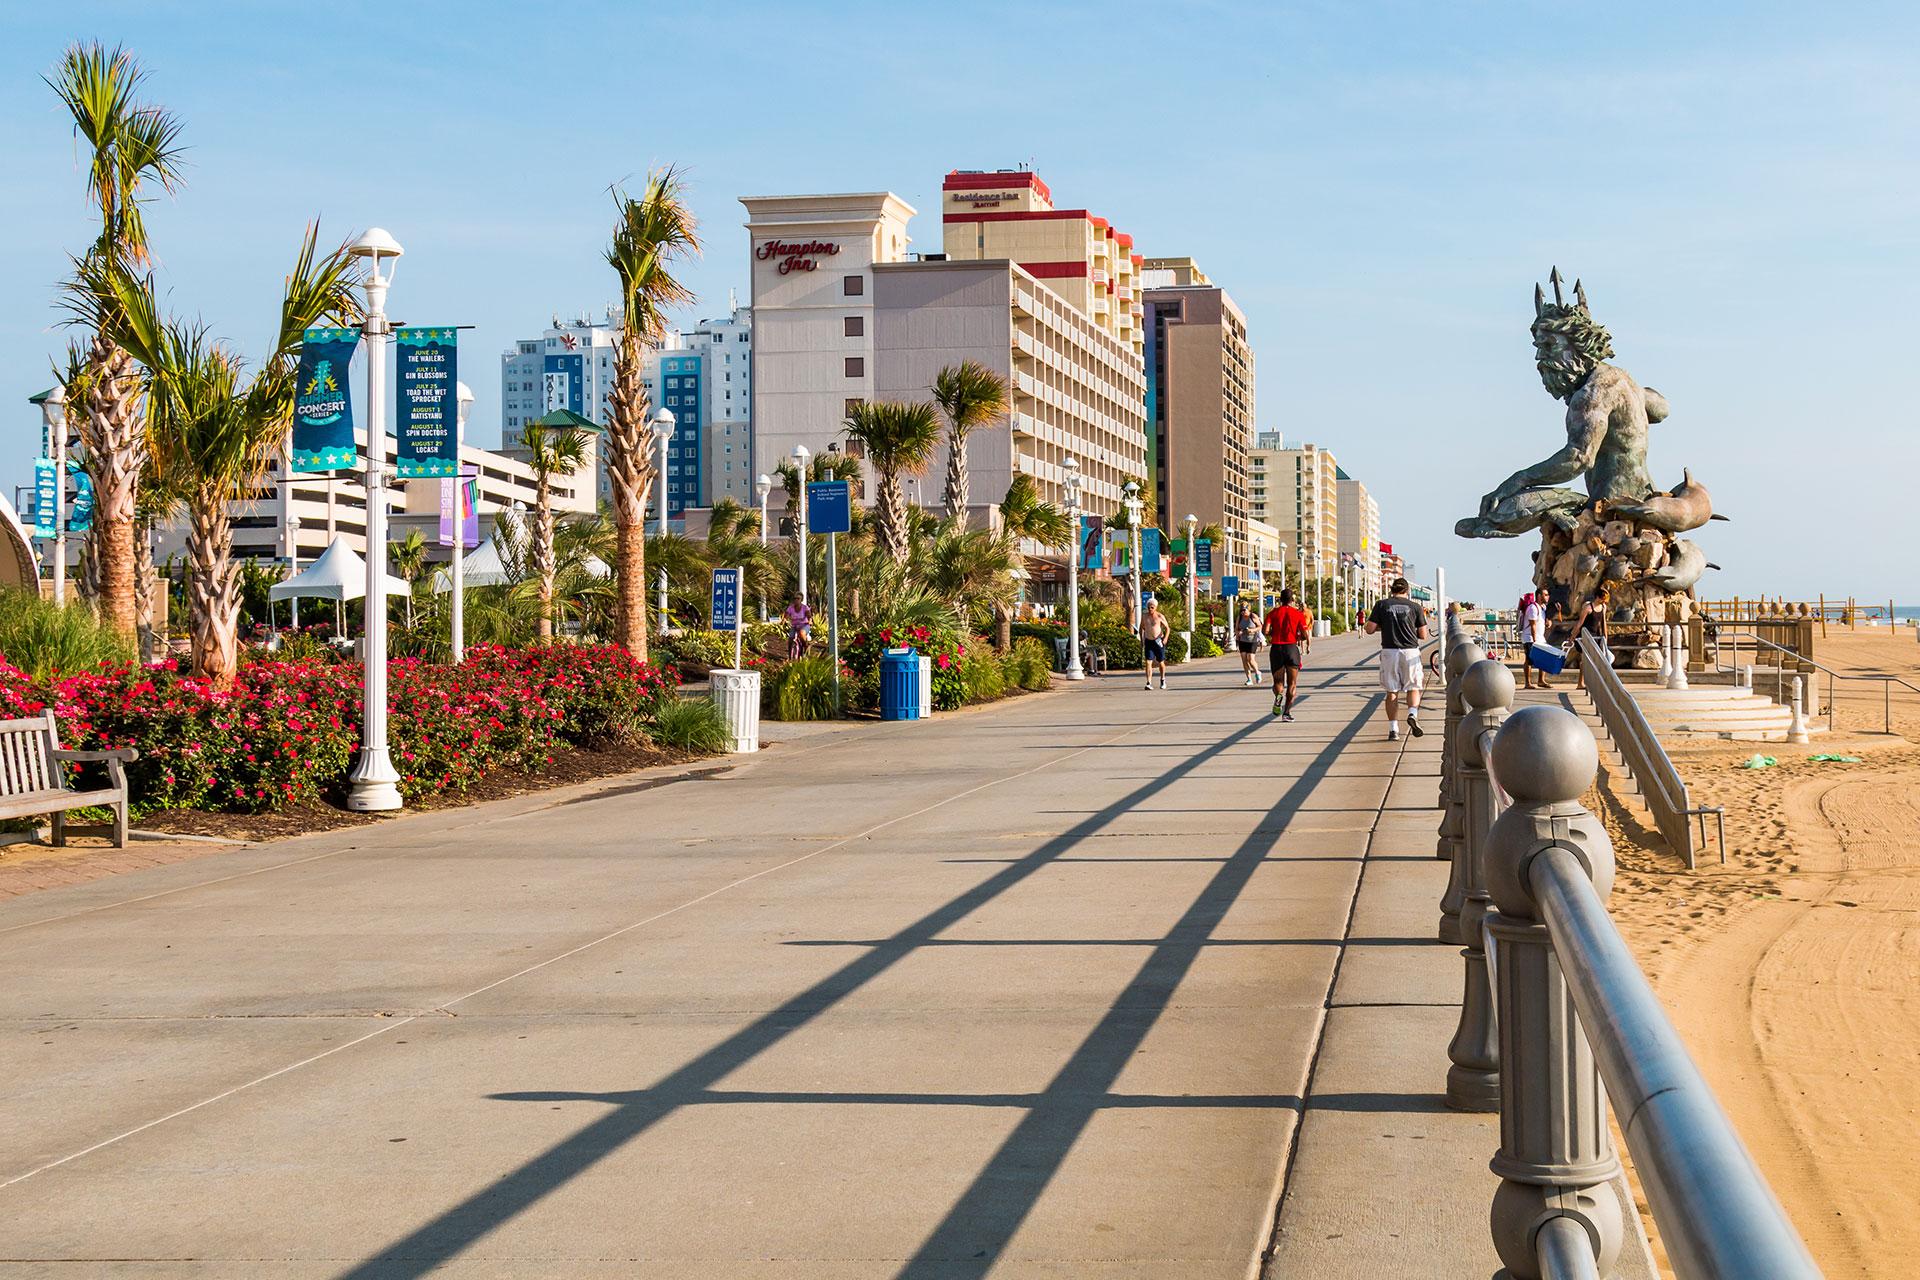 Virginia Beach Boardwalk; Courtesy of Sherry V Smith/Shutterstock.com